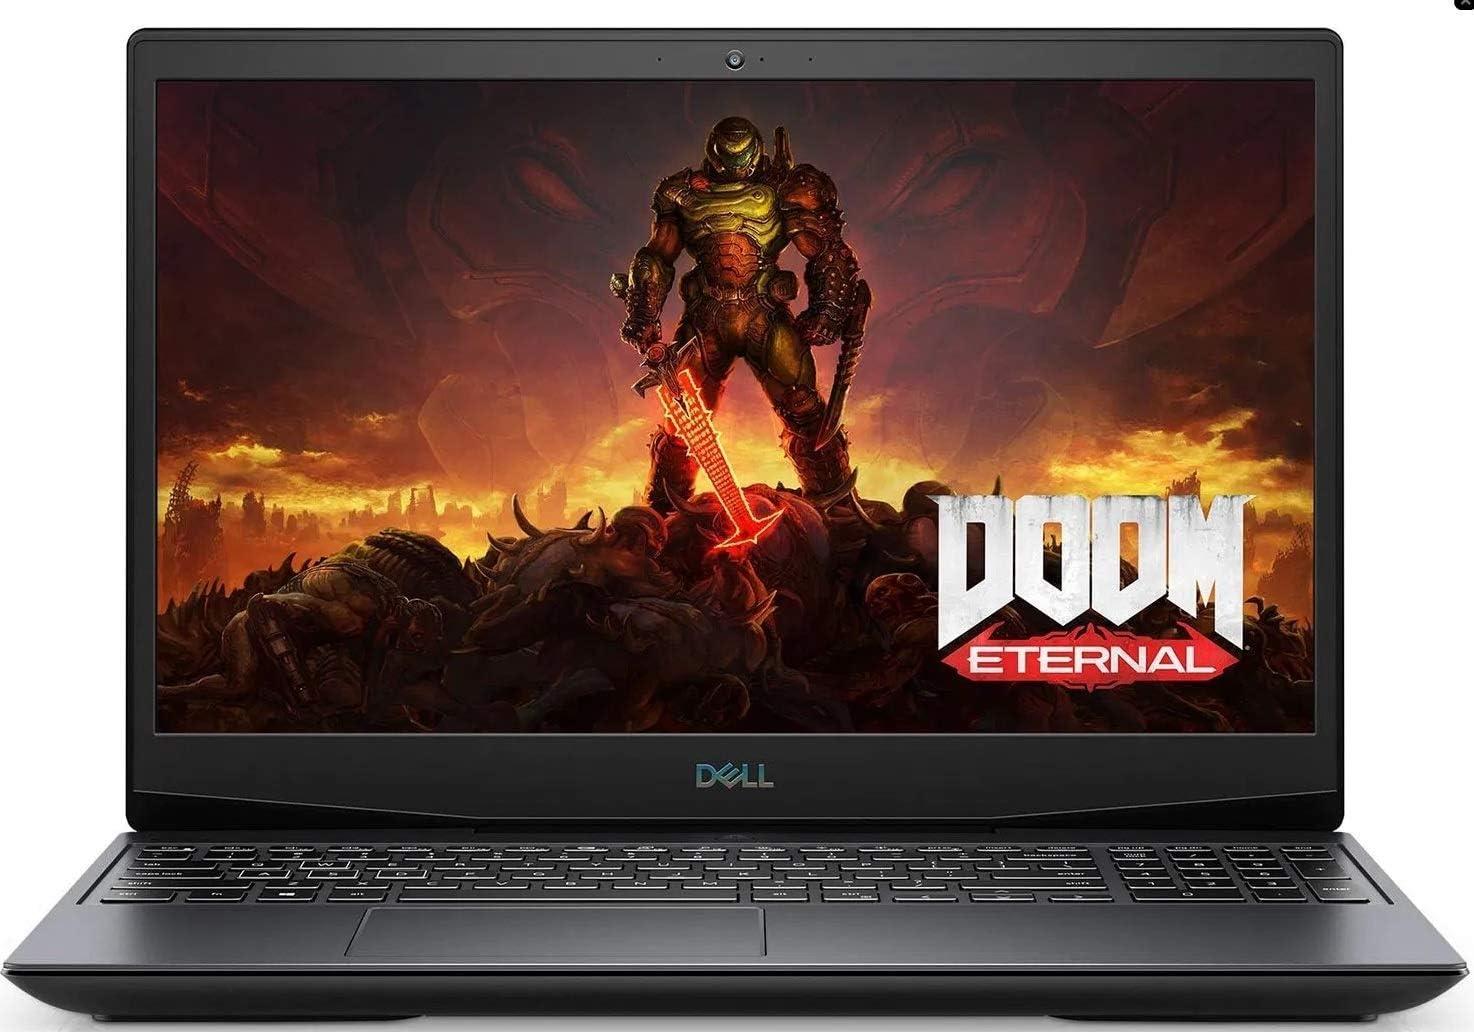 2020 Dell G5 15 Gaming Laptop: 10th Gen Core i7-10750H, NVidia RTX 2070 Max-Q, 1TB SSD, 16GB RAM, 15.6